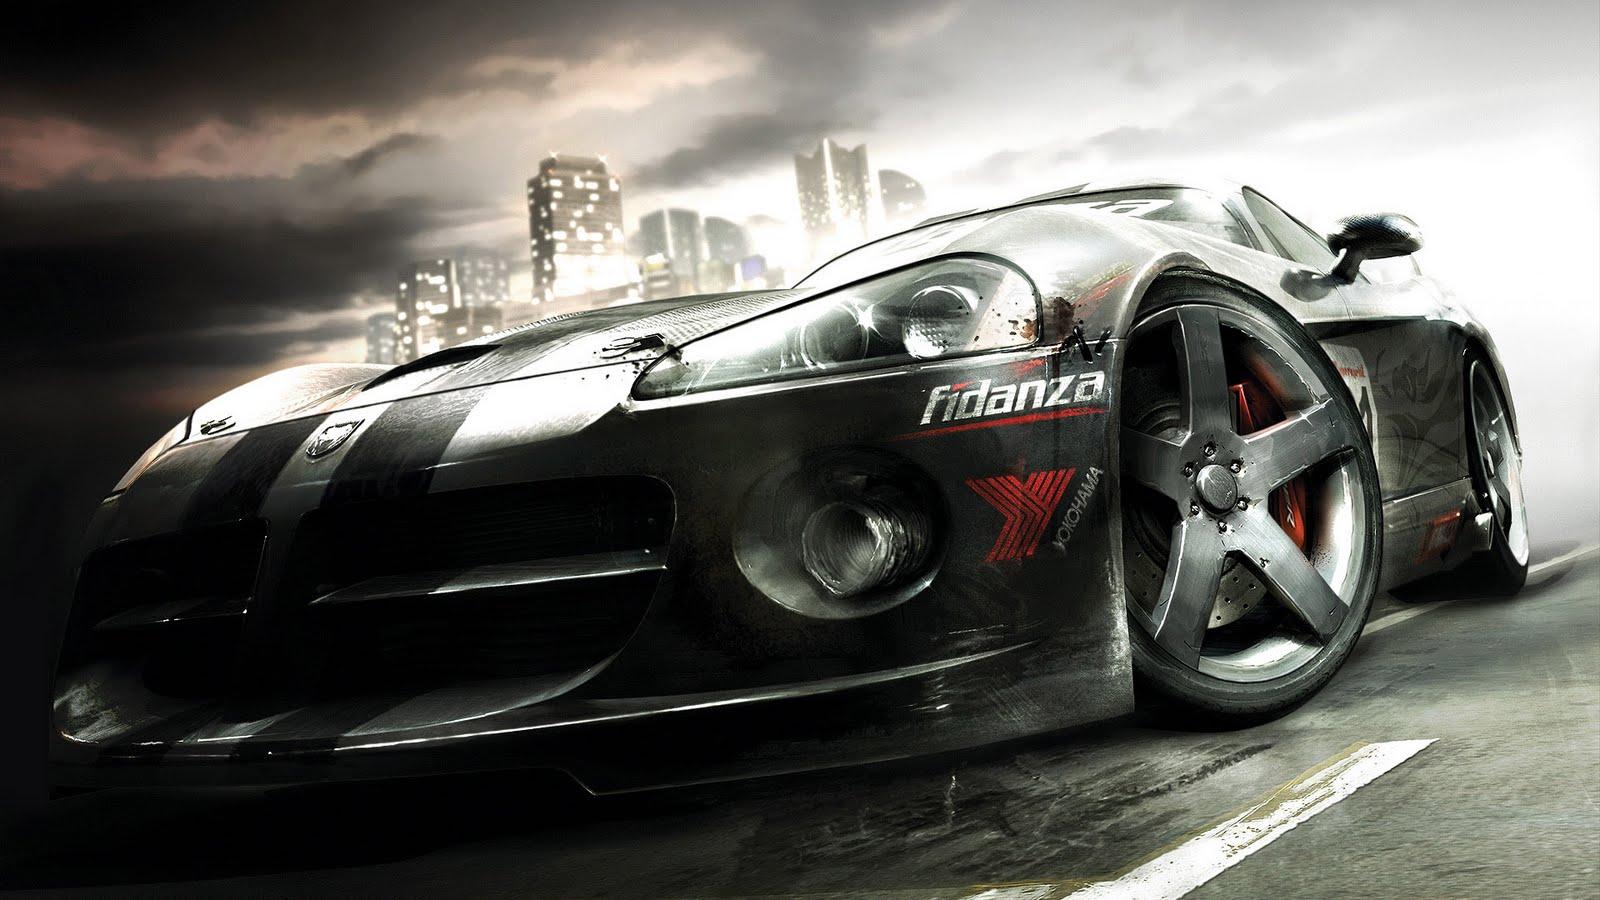 http://1.bp.blogspot.com/-l-YPMm0wqQc/ThJZ5FqyhtI/AAAAAAAACQg/yWJqDS3yWM4/s1600/carro-desportivo-tons-escuros-imagens-imagem-de-fundo-wallpaper-para-p